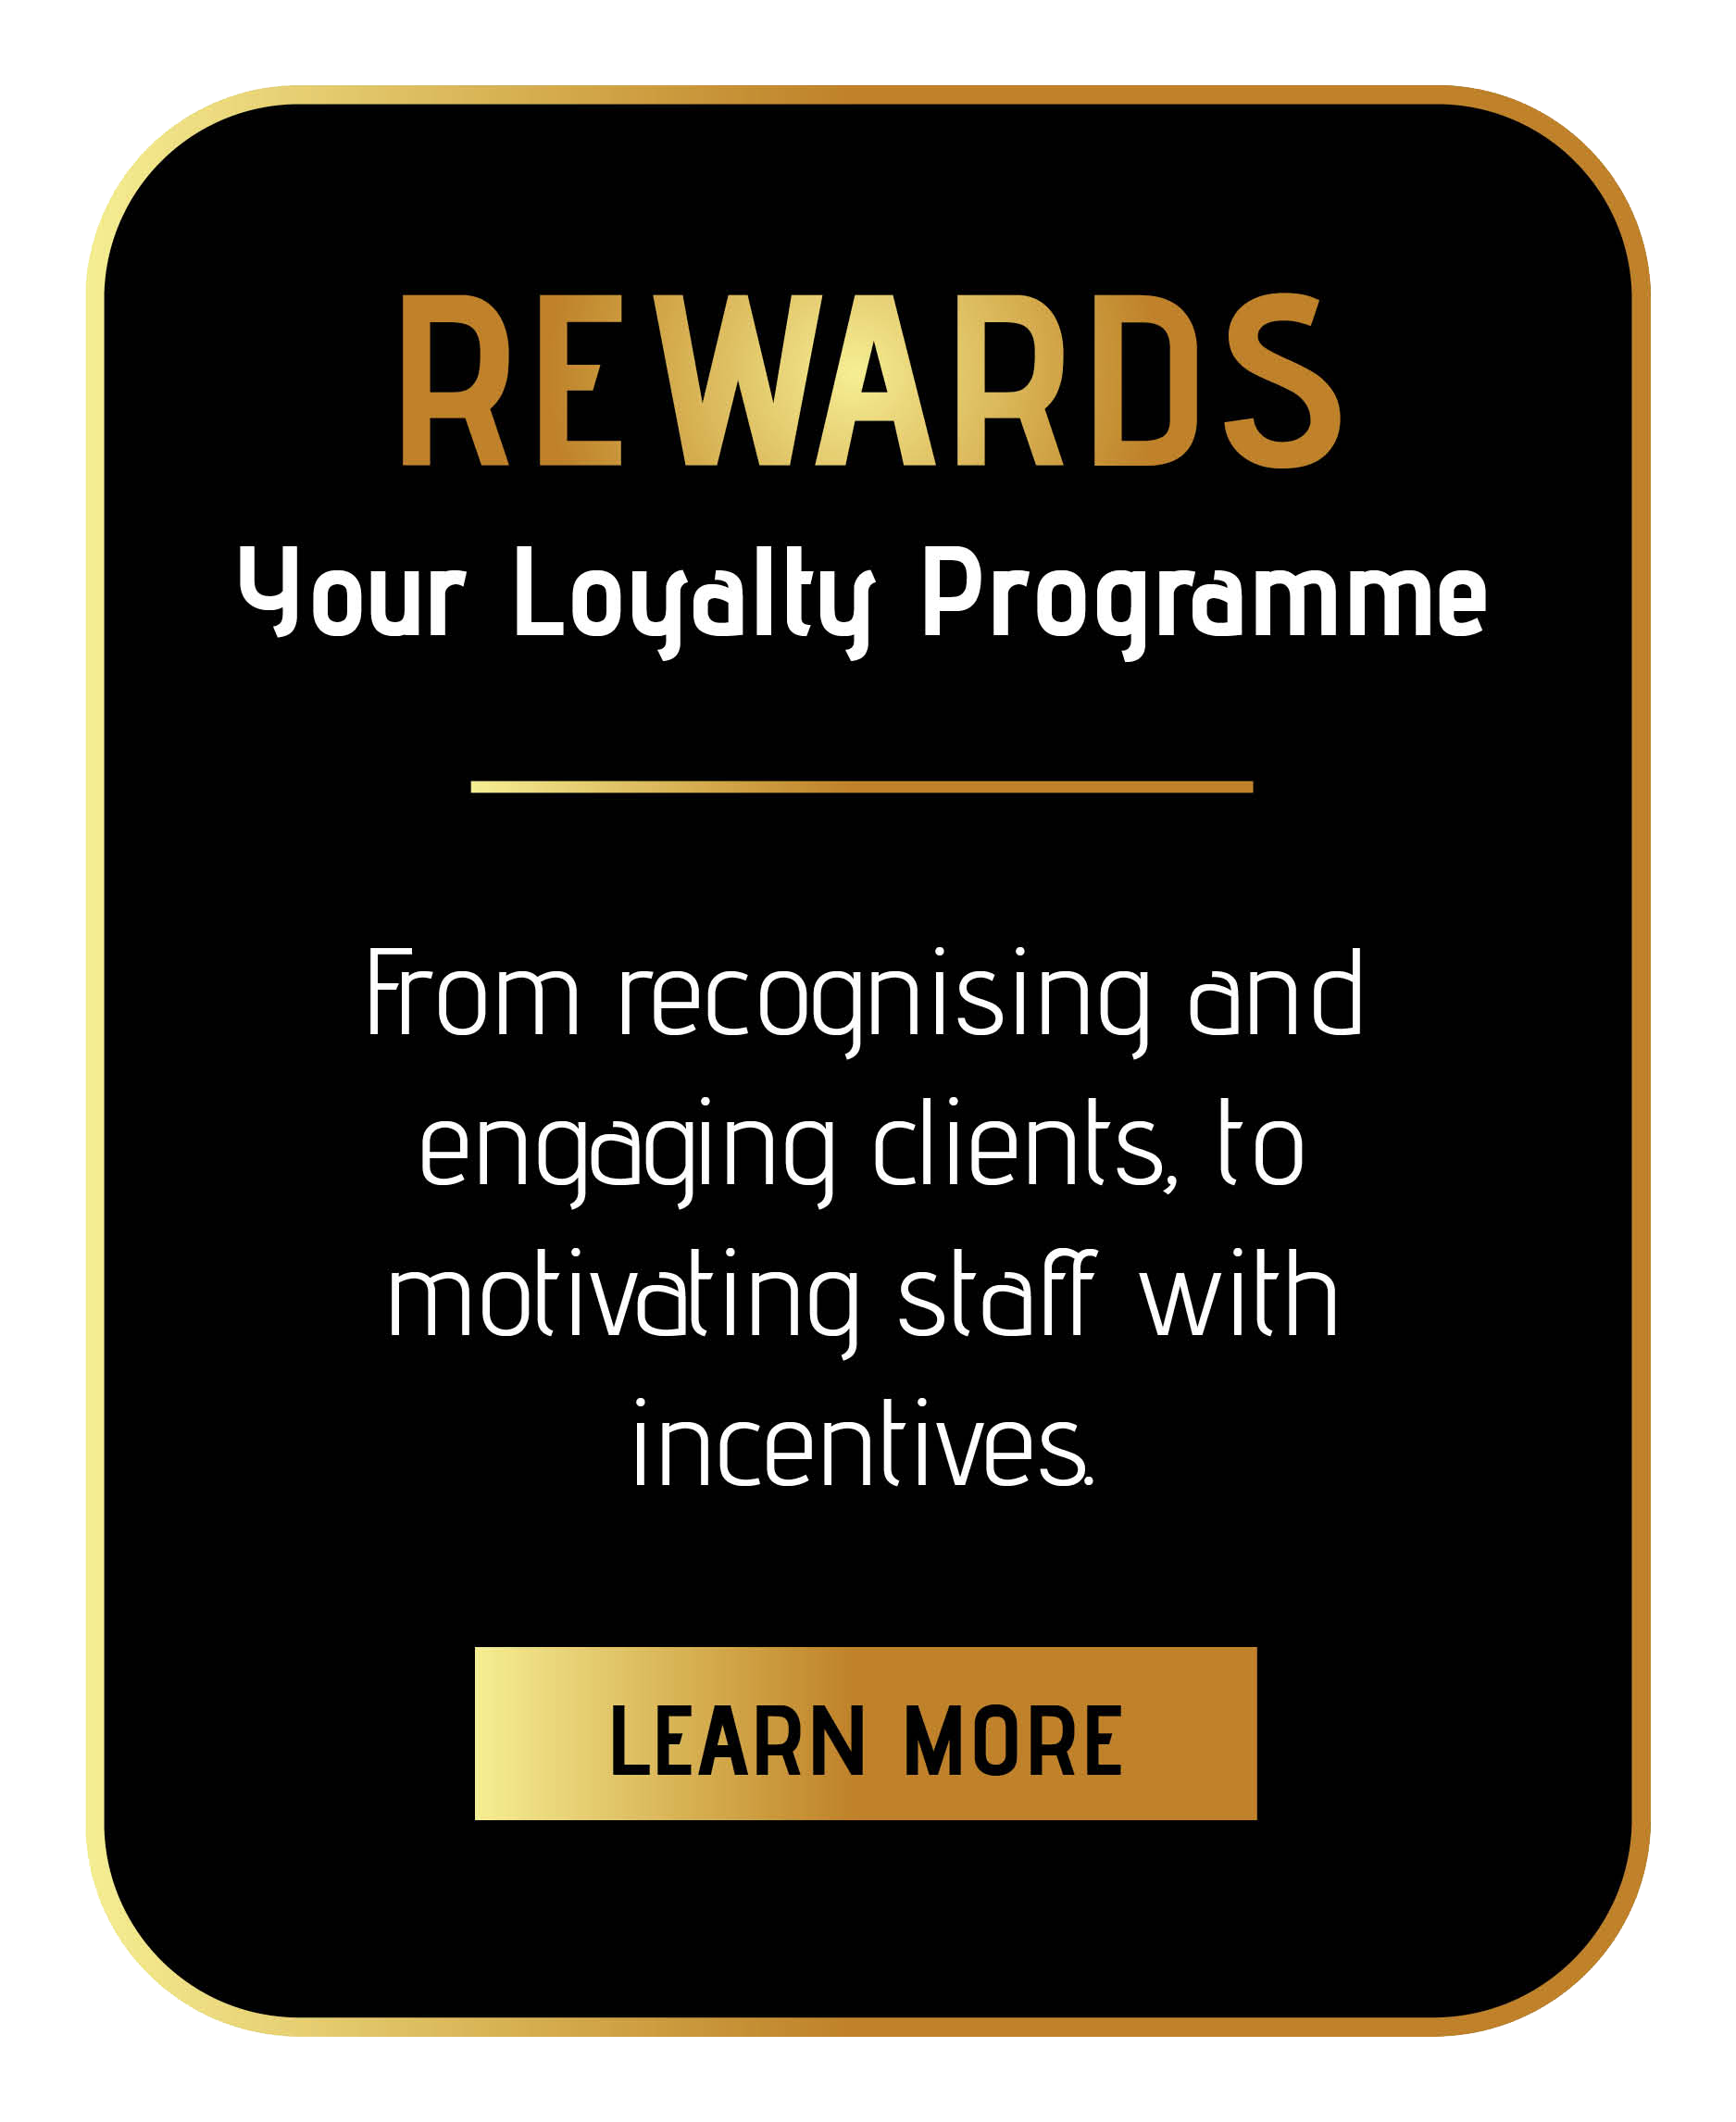 client rewards and insentive scheme through sincura concierge